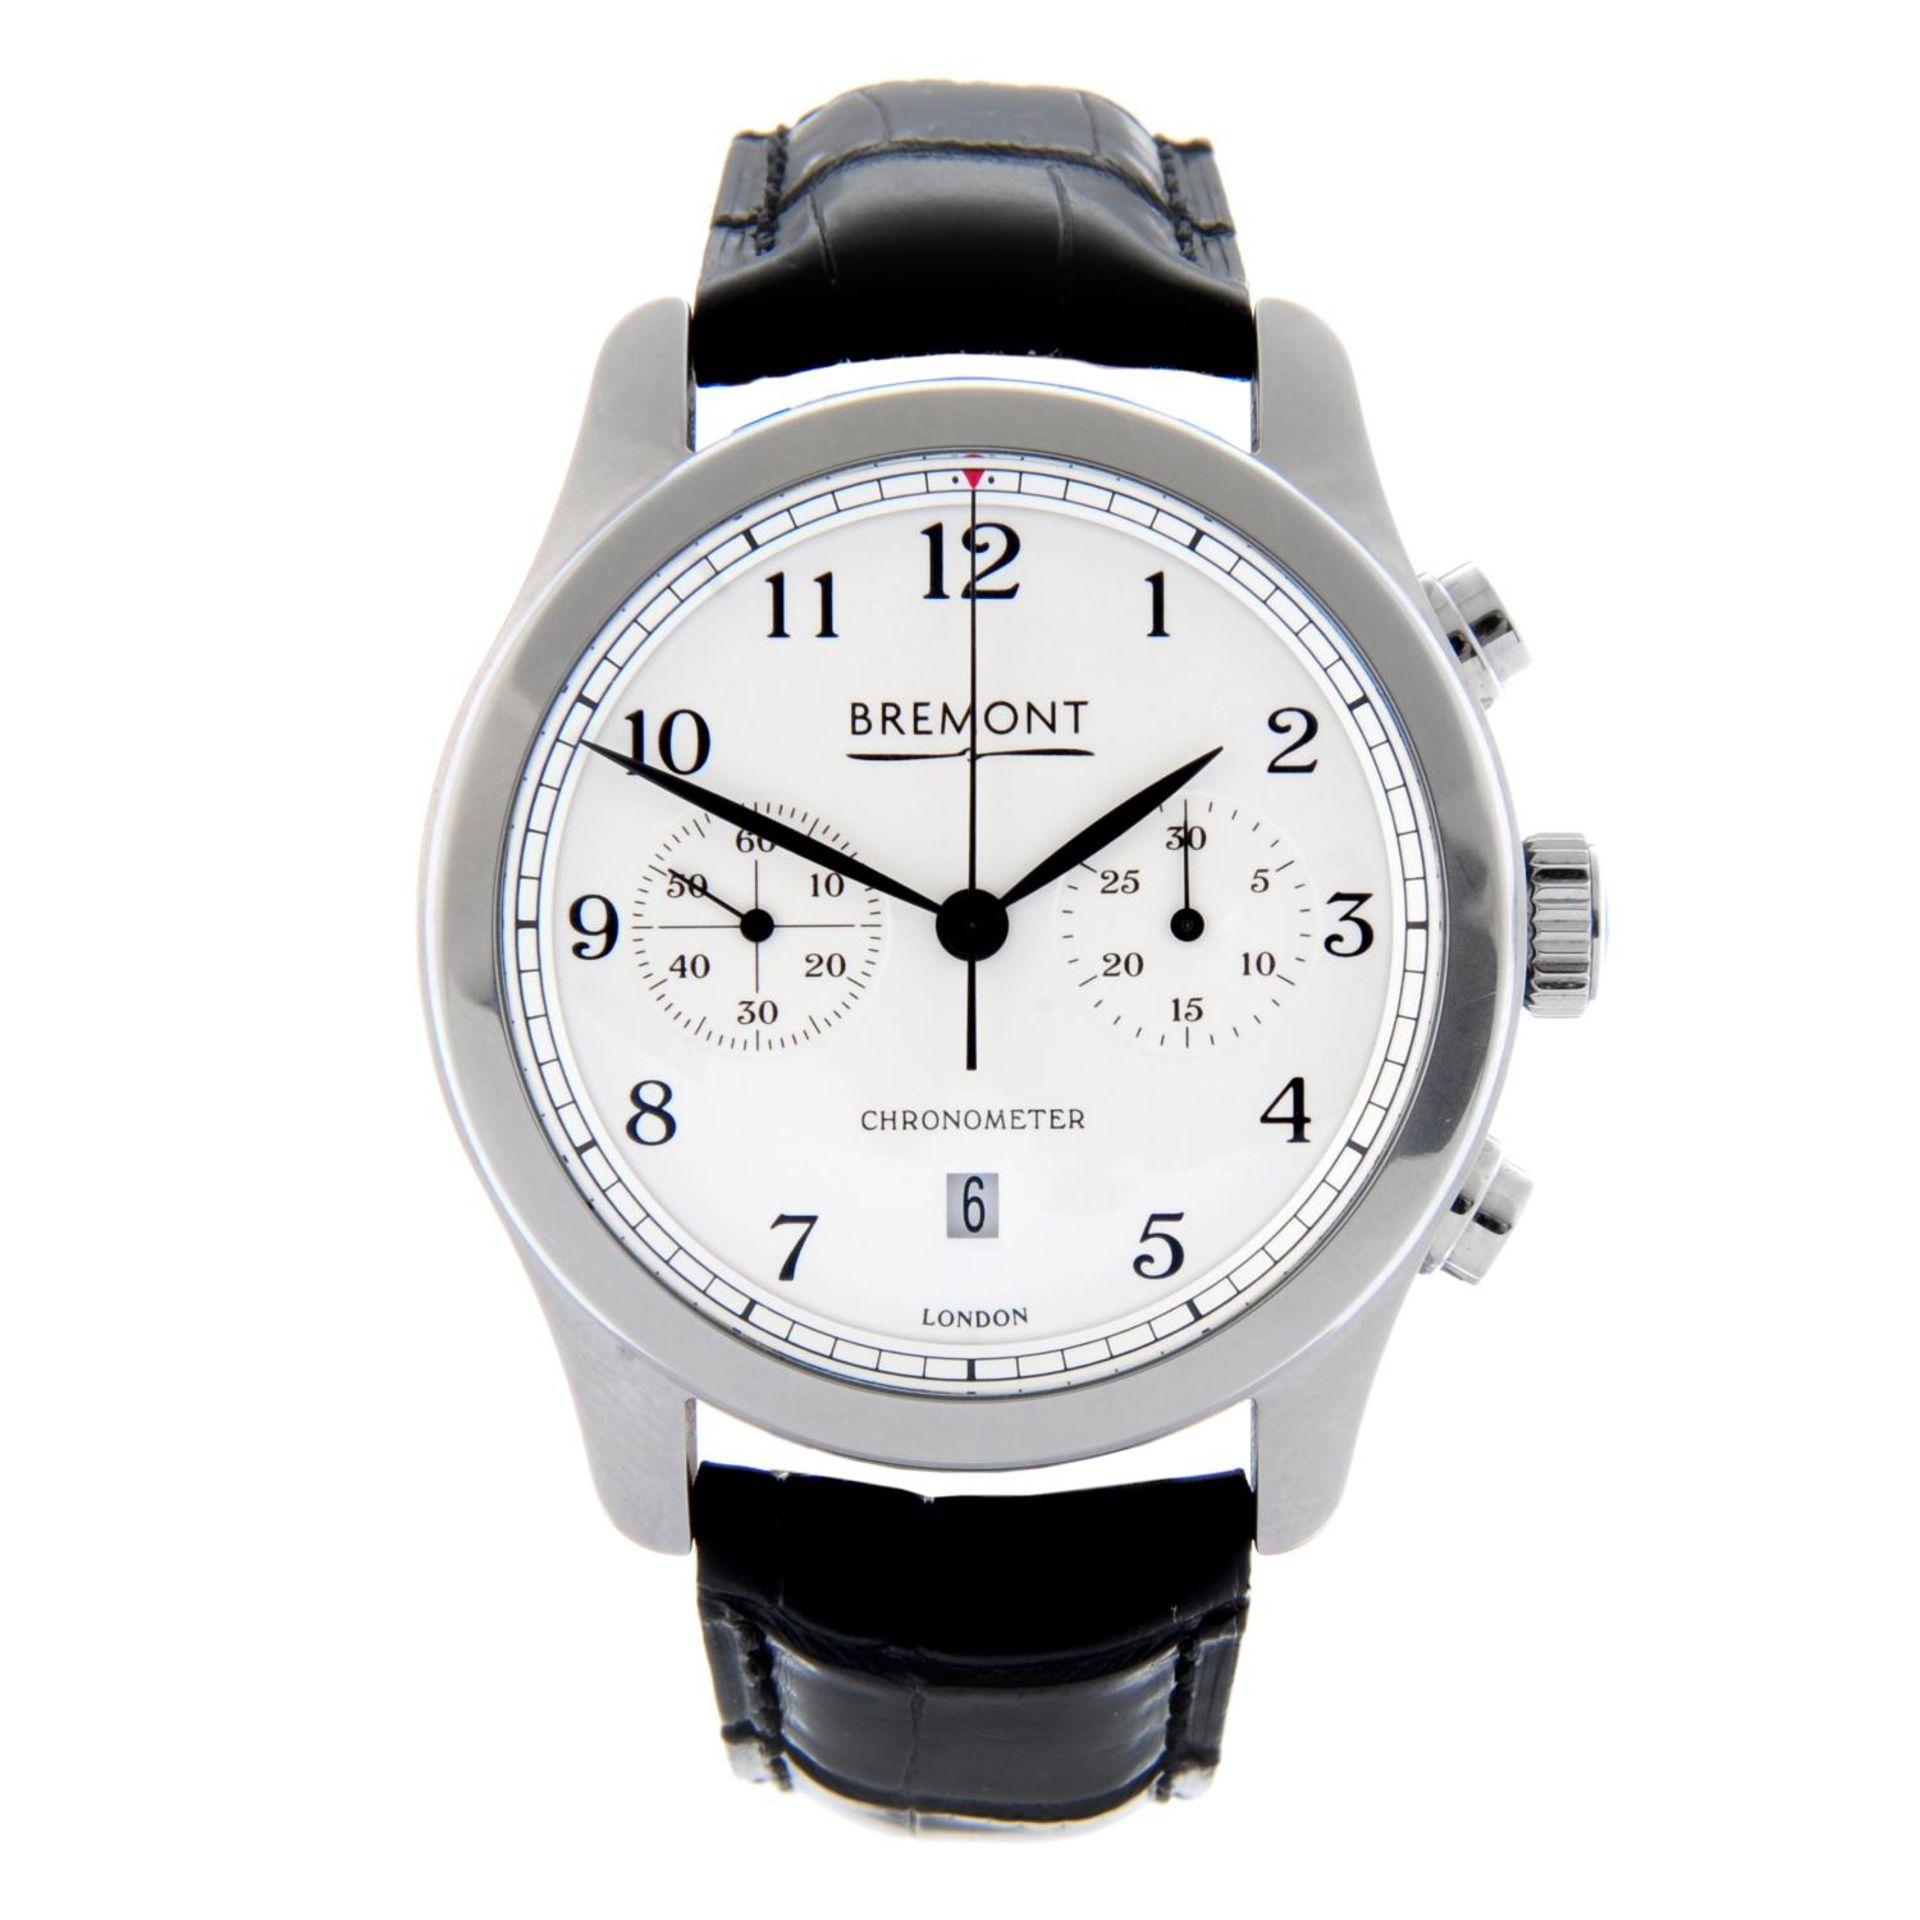 BREMONT - an ALT1-C wrist watch.